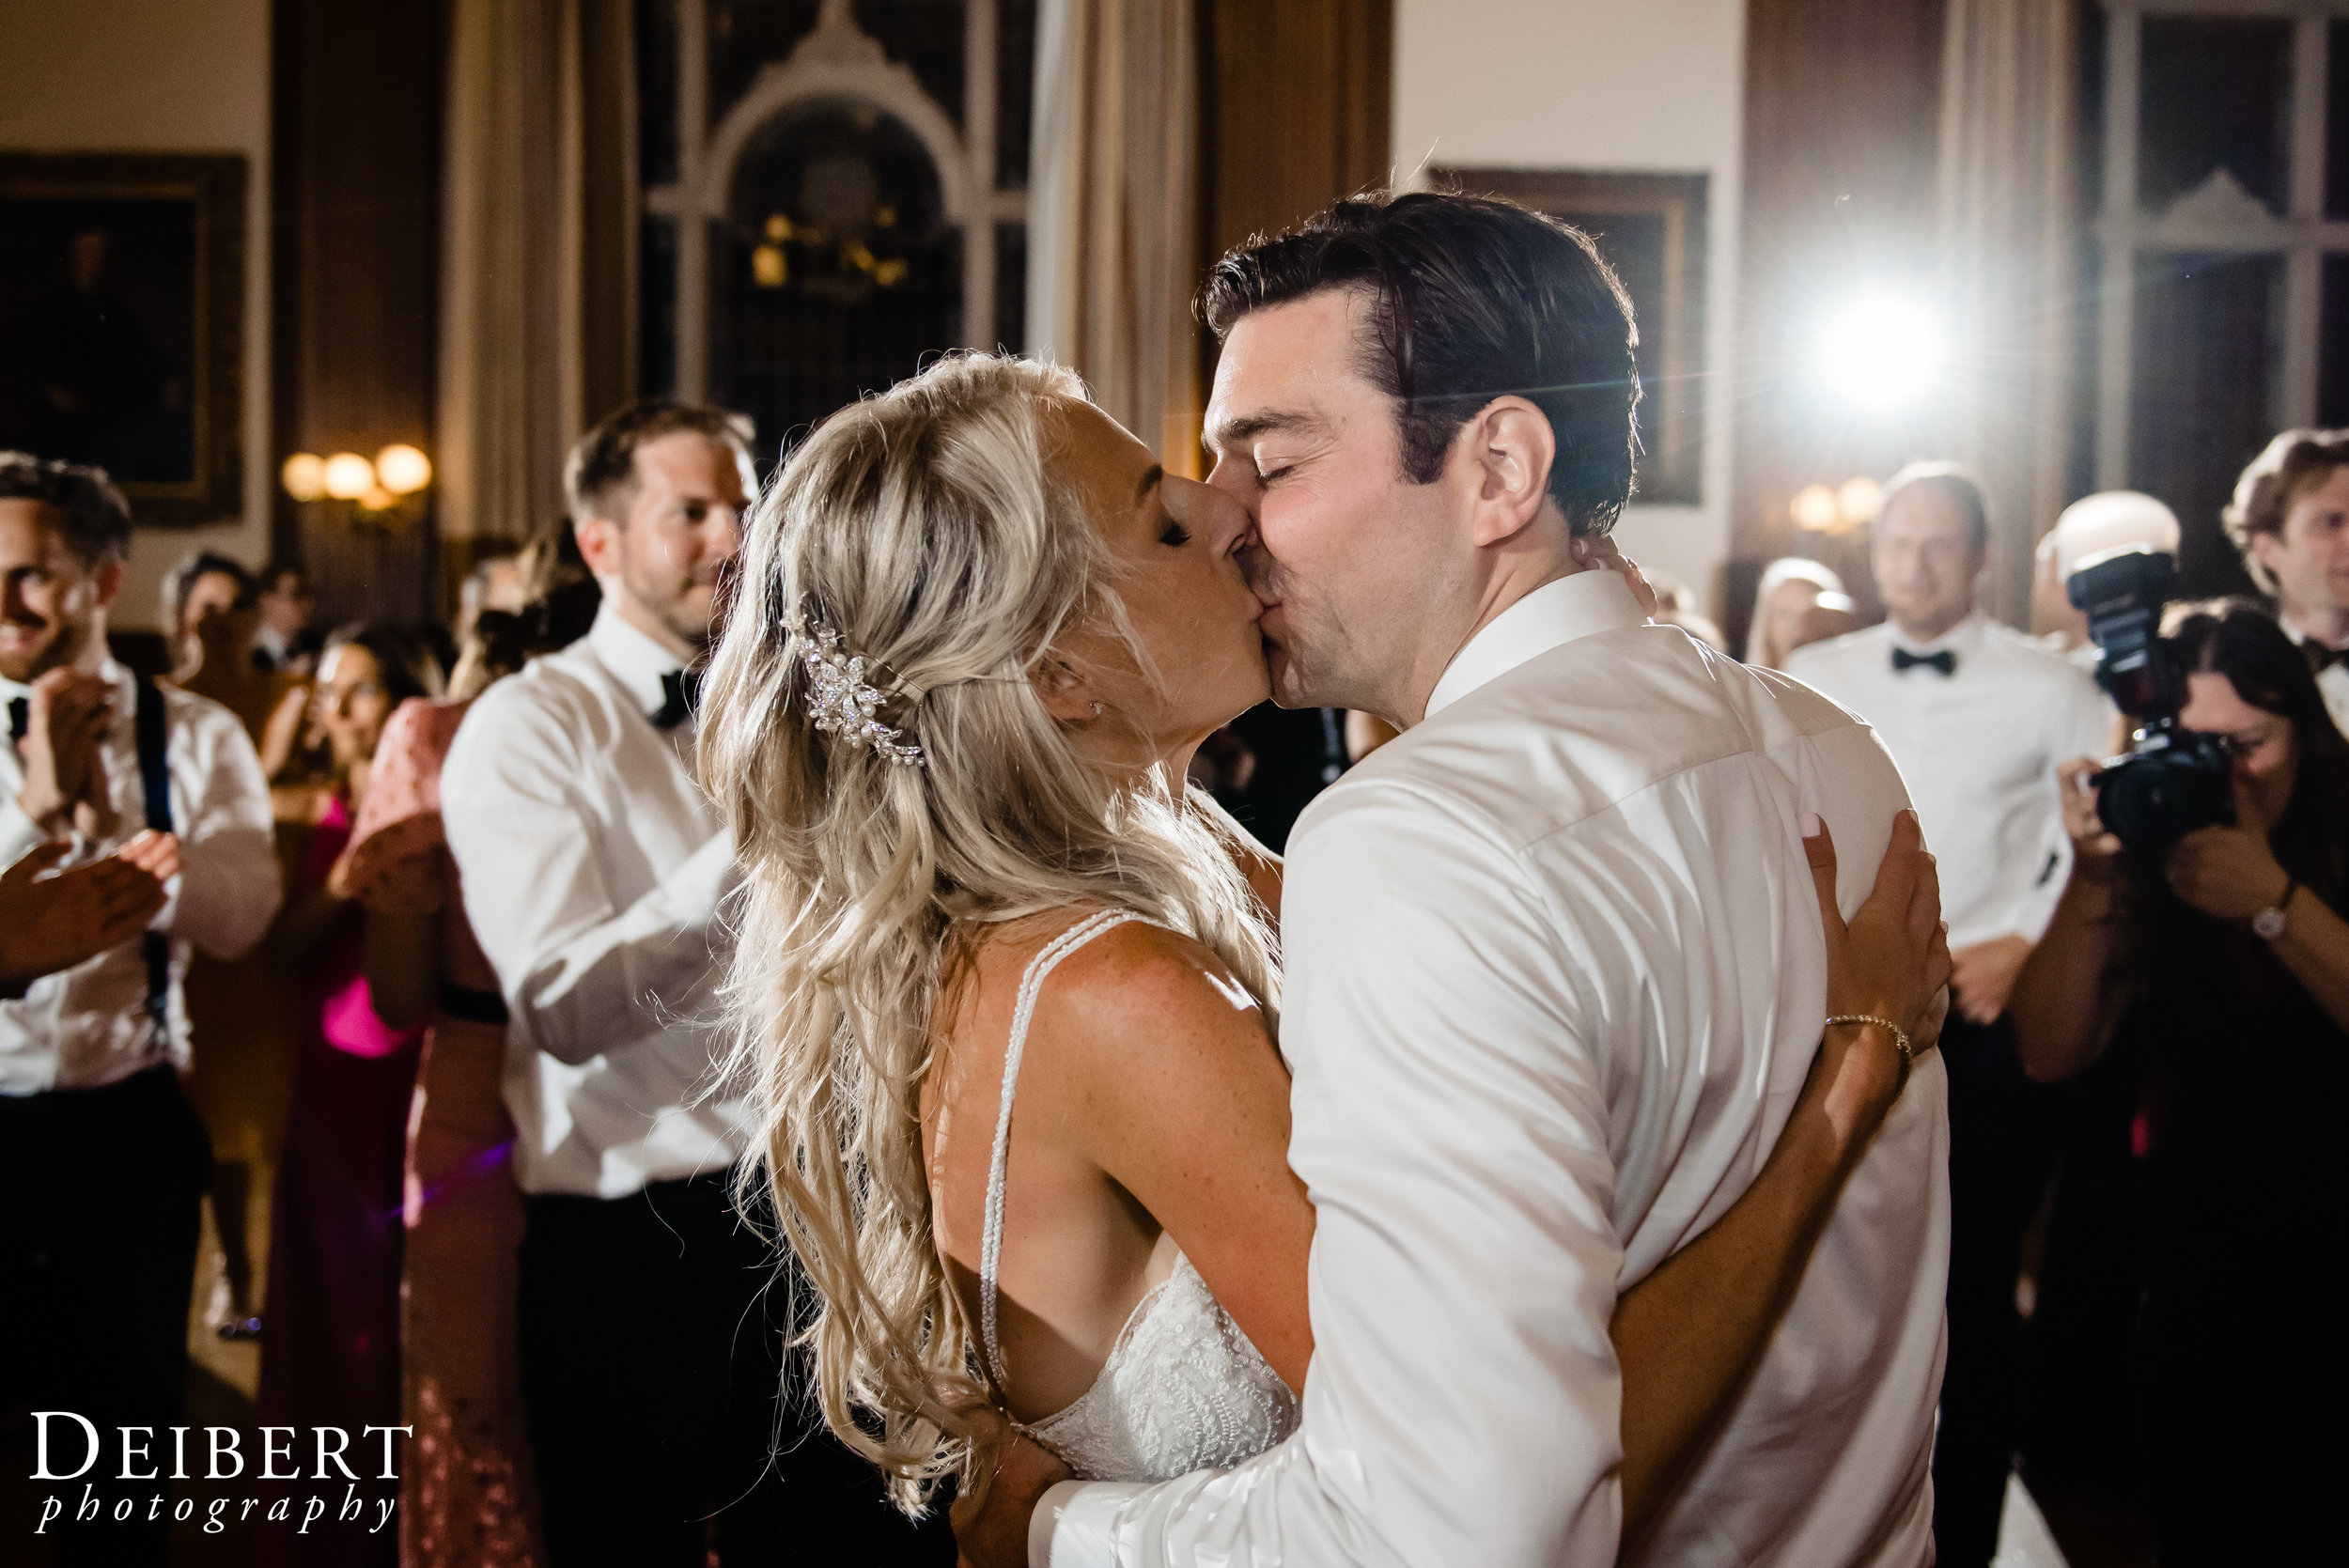 College_of_physicians_wedding-5.jpg